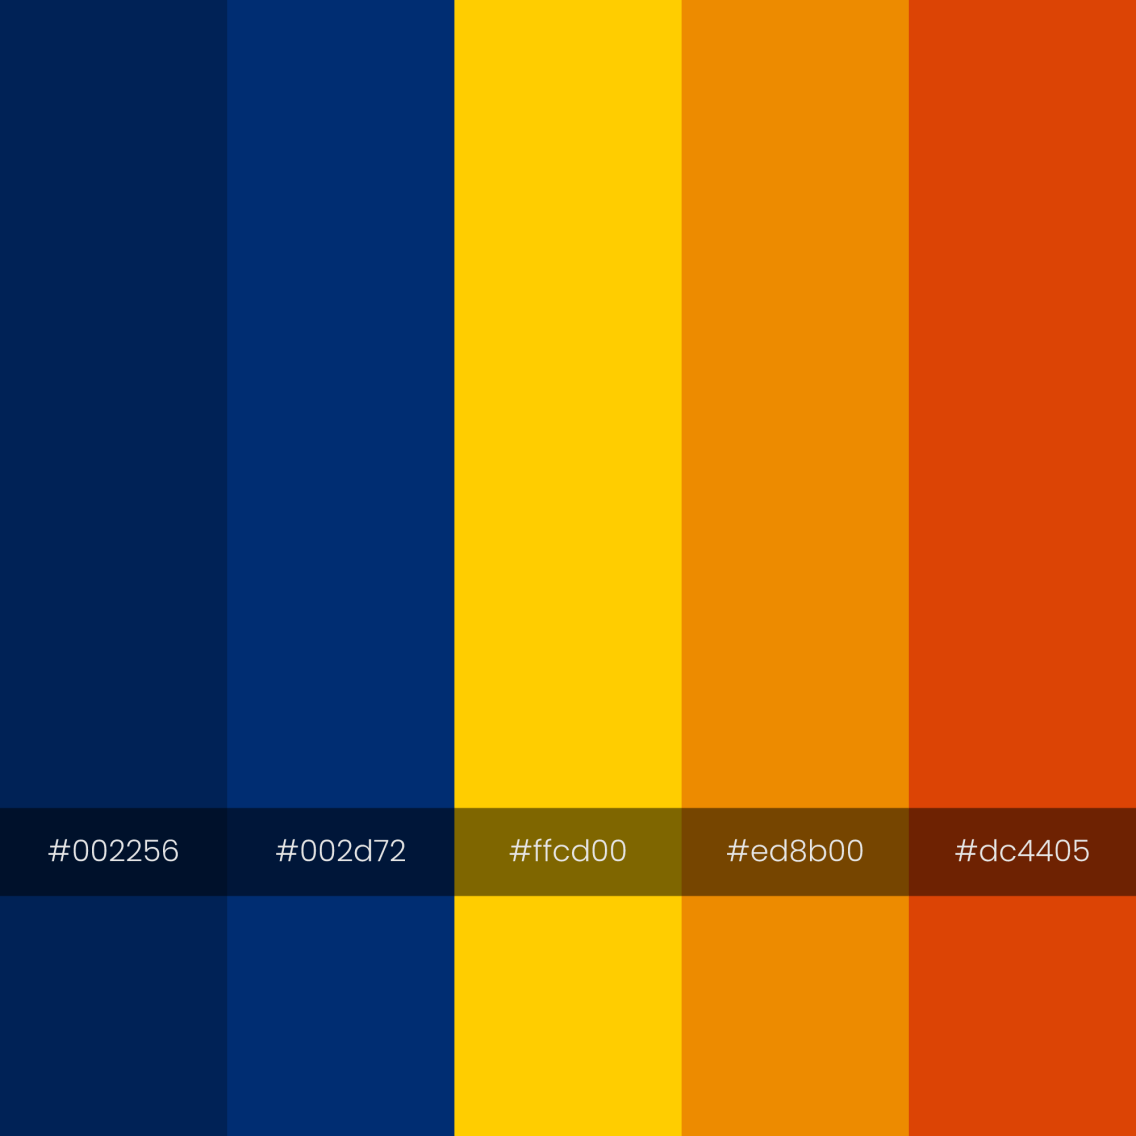 color-palette-2000-2000-morgenland-extended